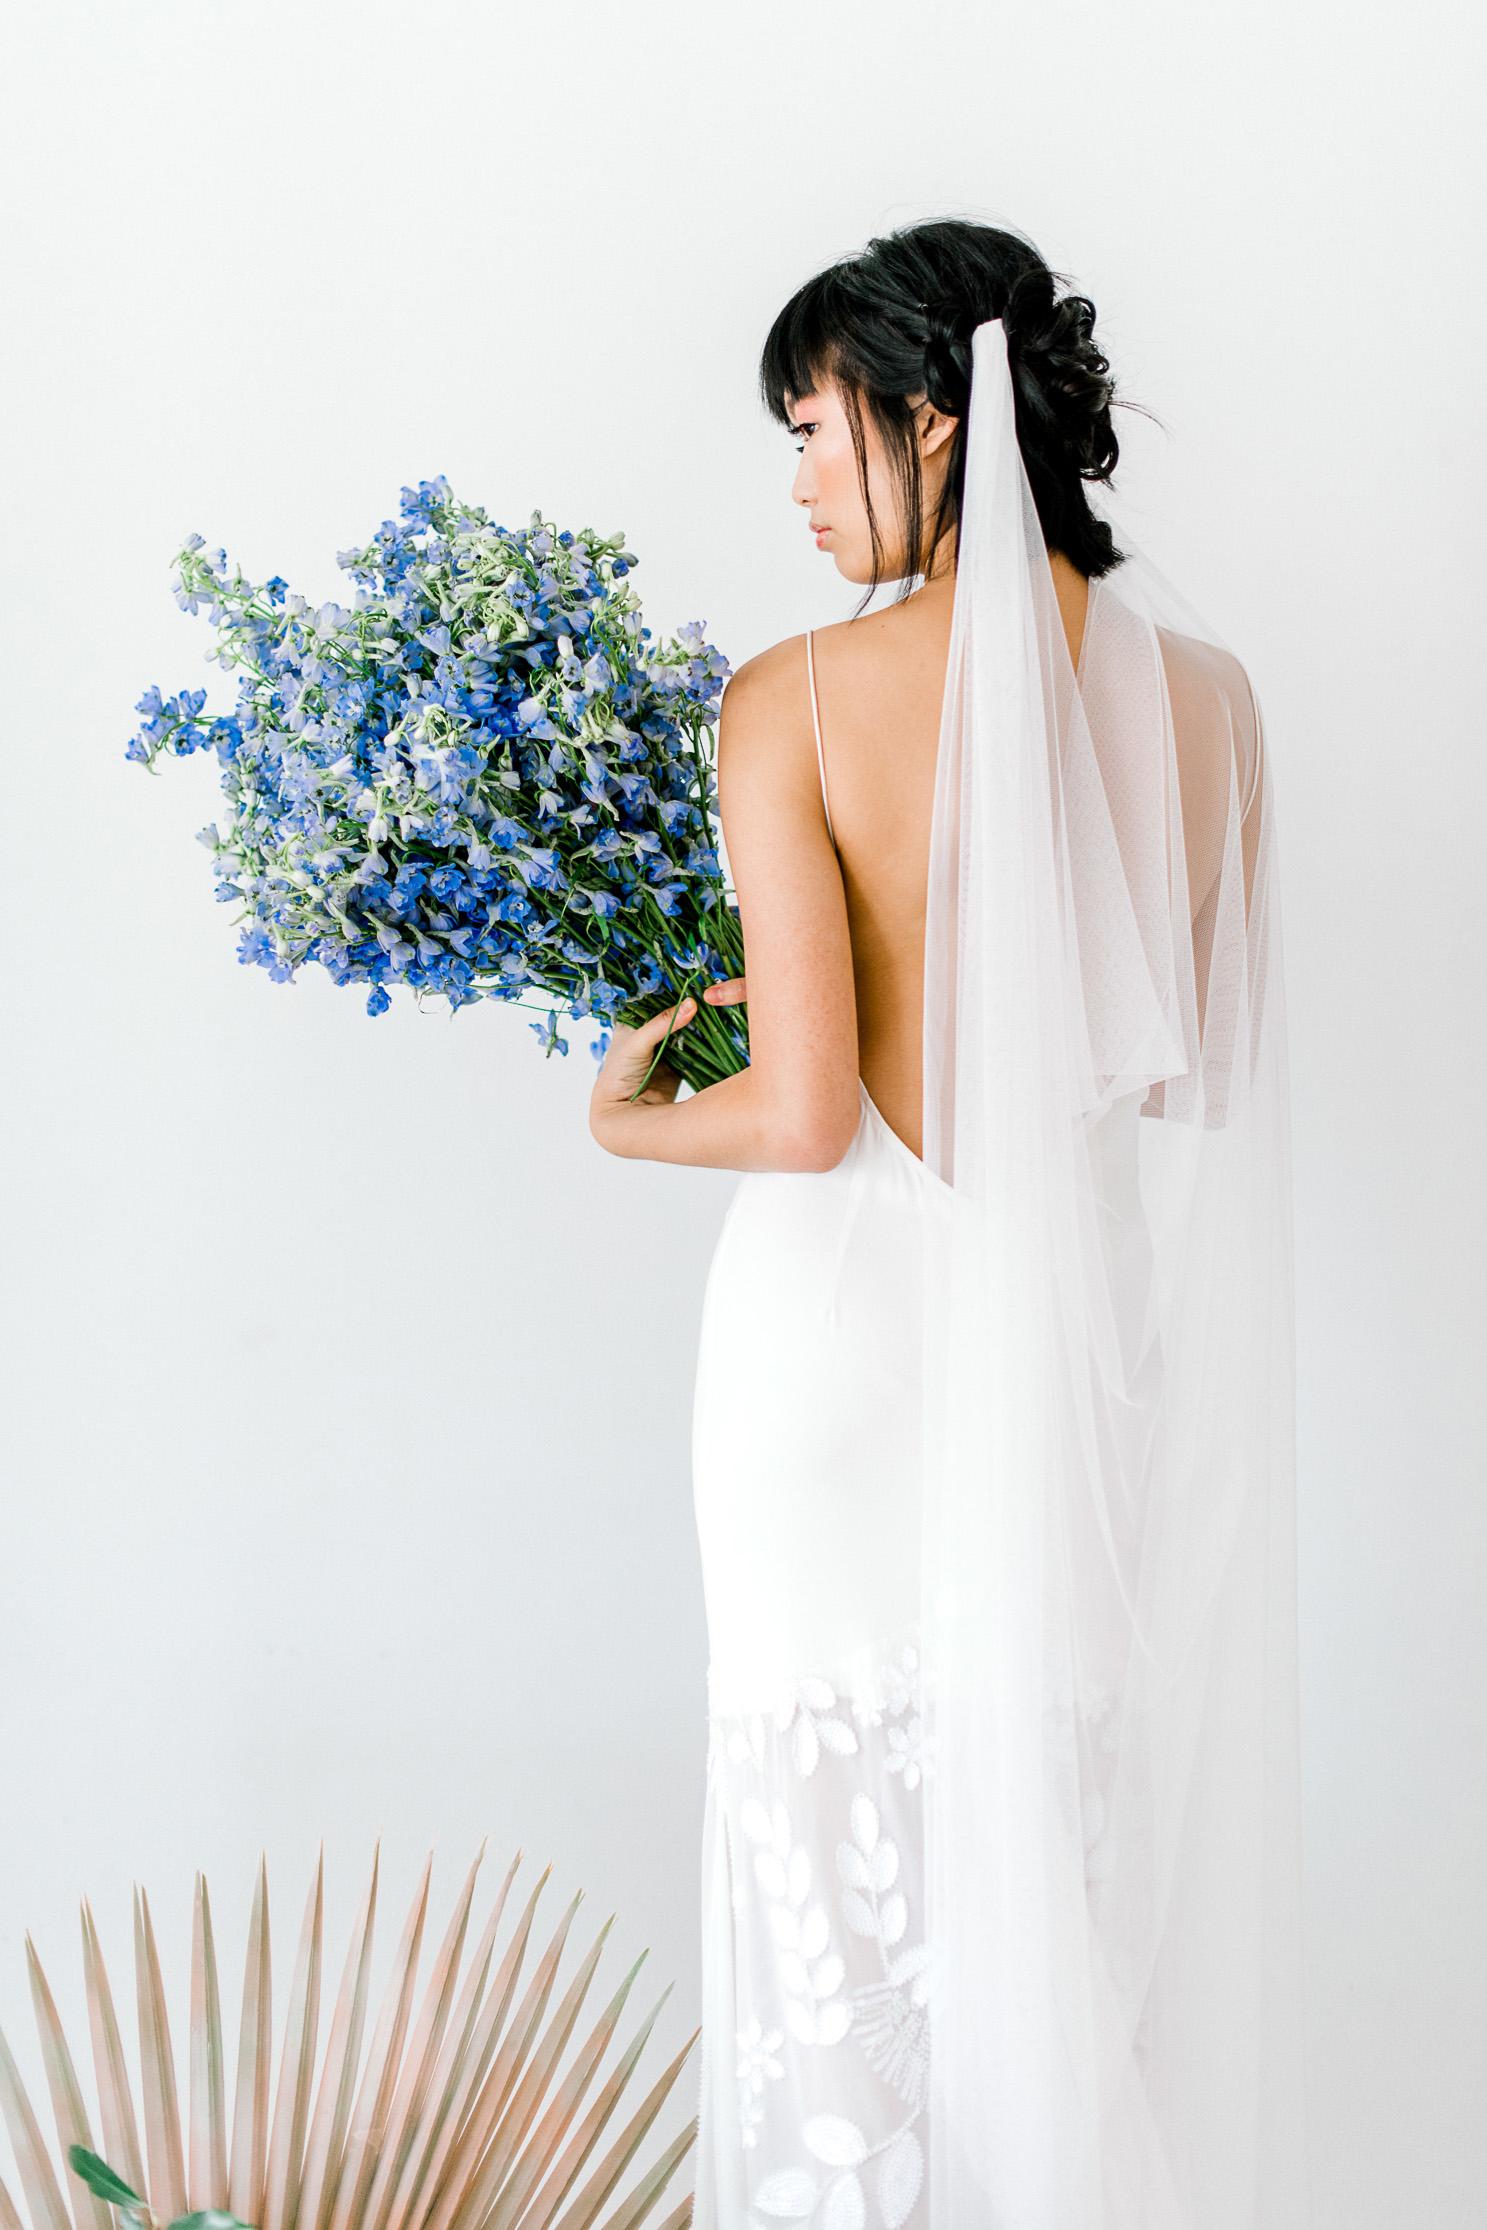 Houston-Wedding-Photographer-Editorial-Fine-Art-Film-Destination-Dallas-Texas-Mibellarosa-Josh-Dana-Fernandez-Photography-223.jpg